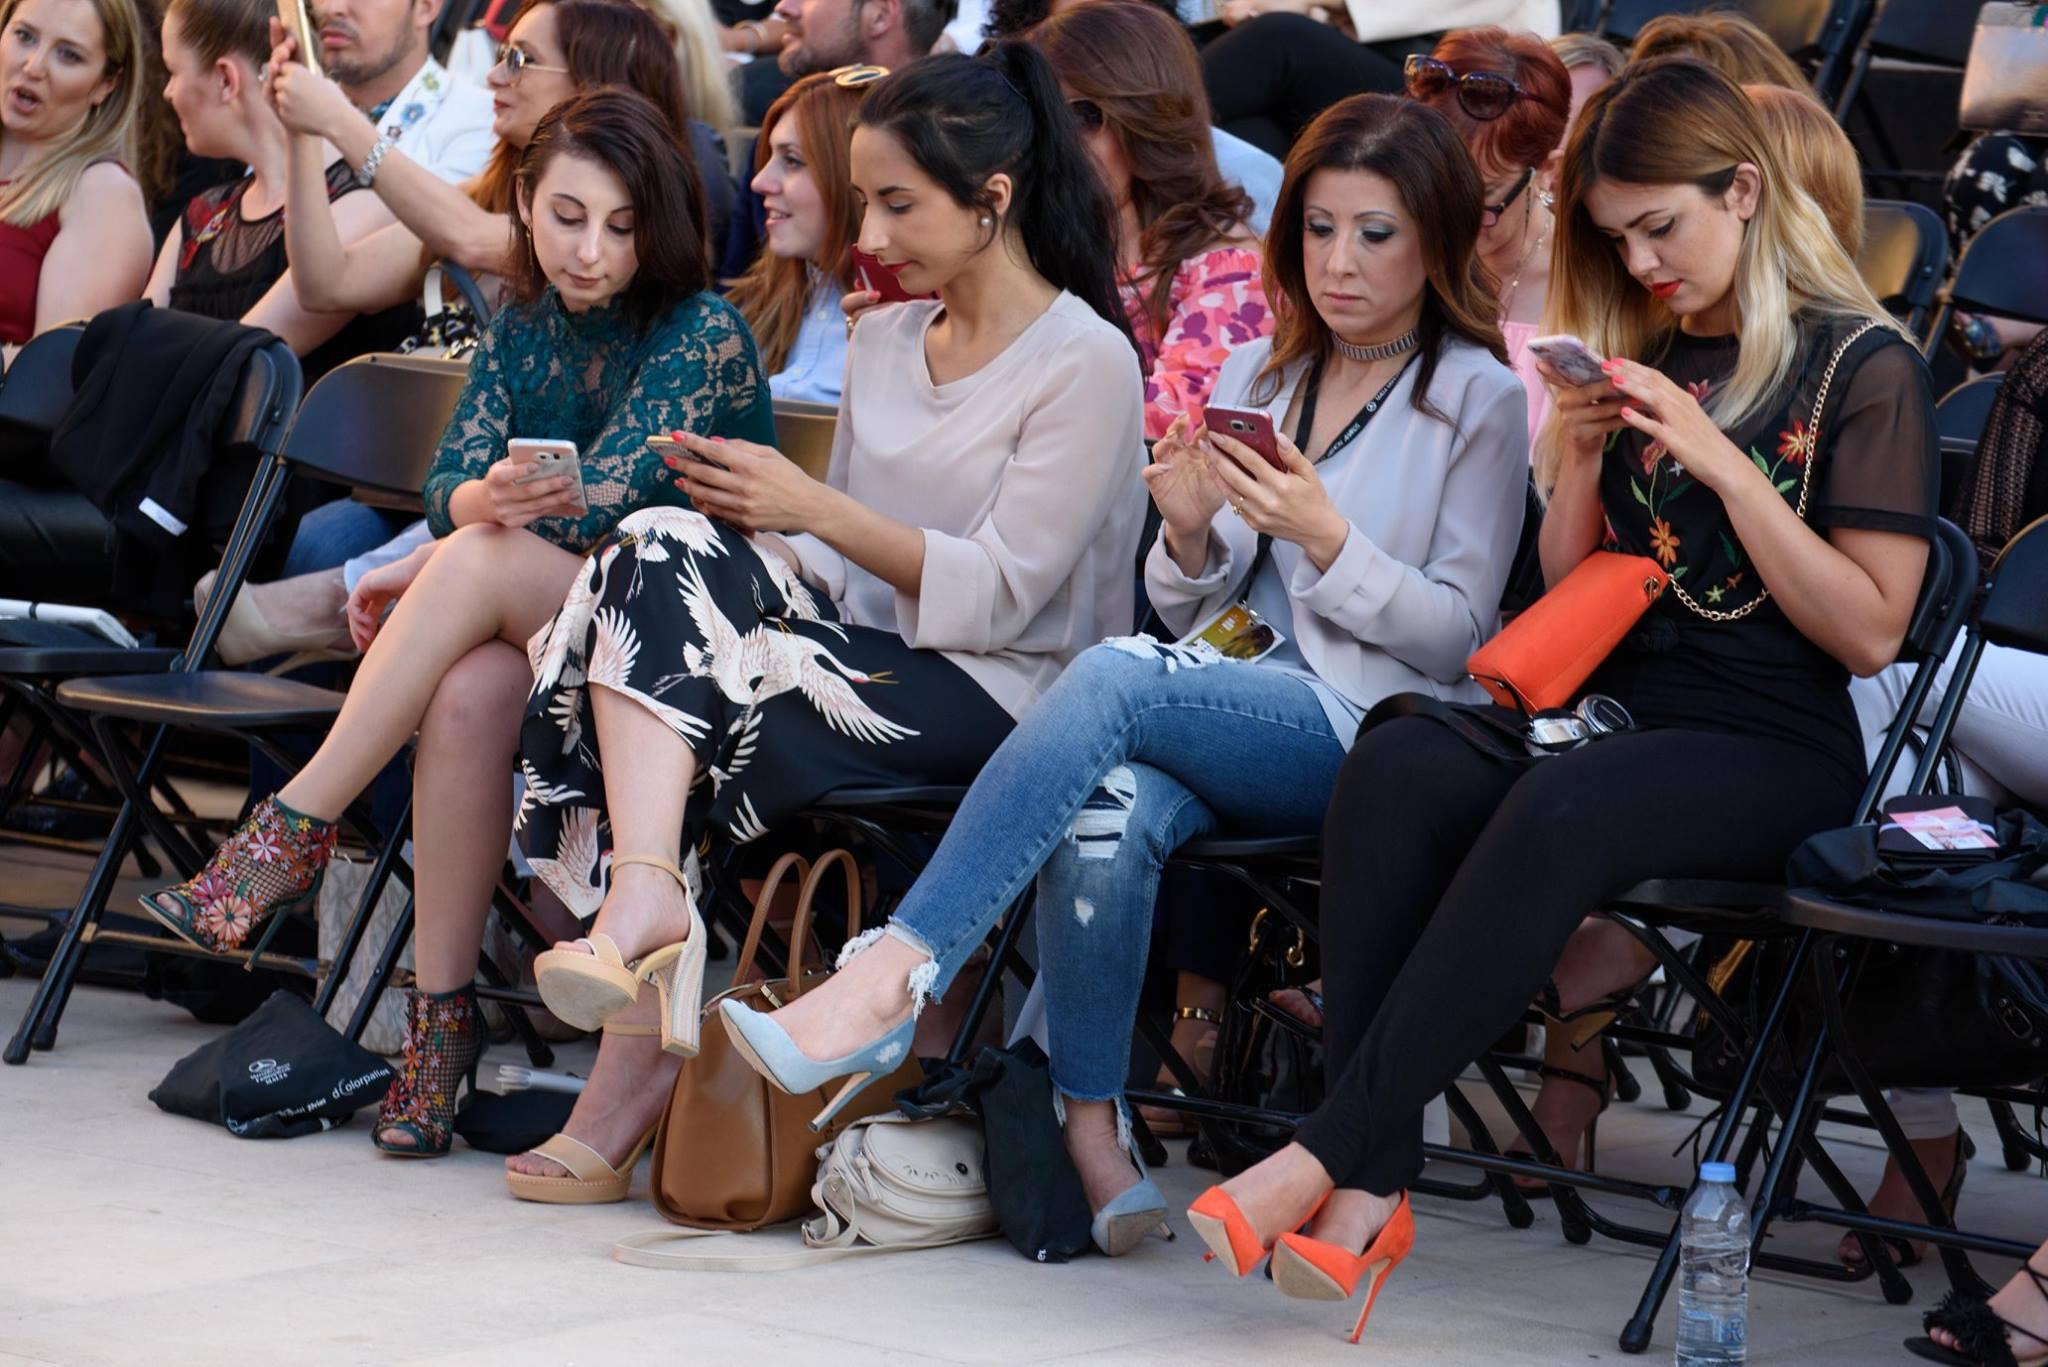 Malta bloggers at work